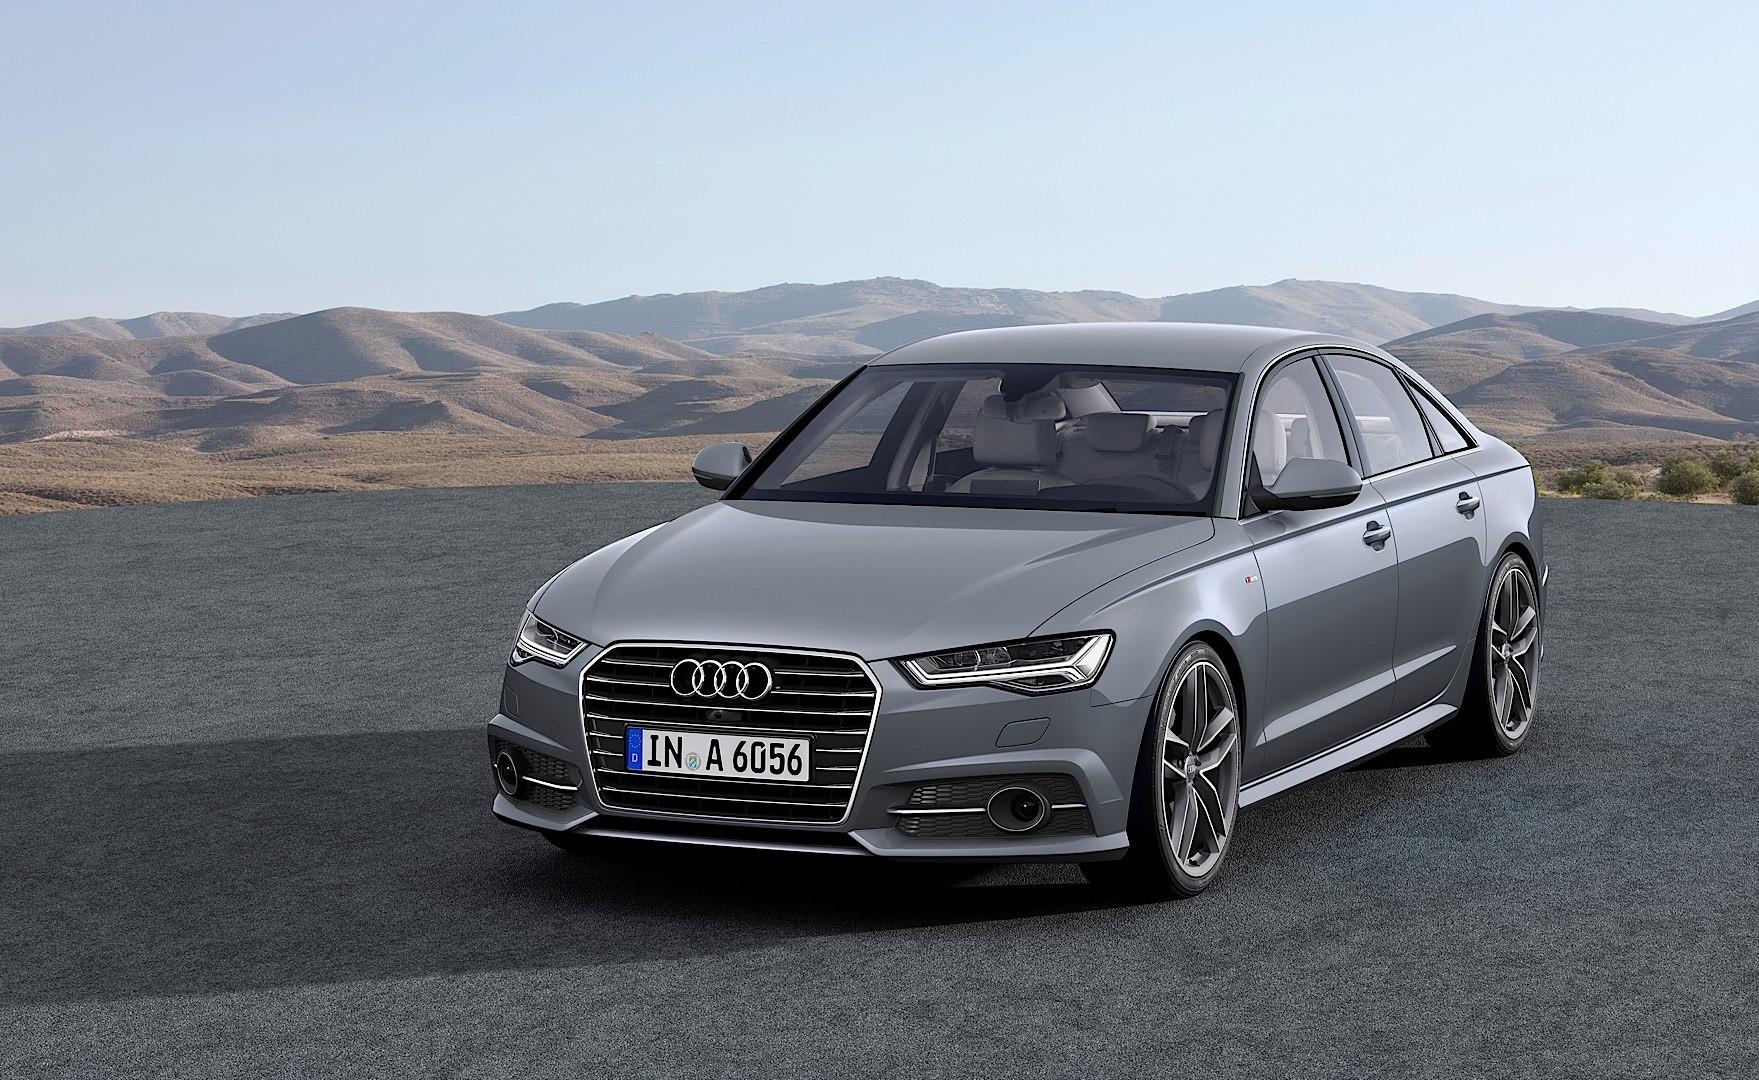 Kelebihan Kekurangan Audi S6 2015 Murah Berkualitas